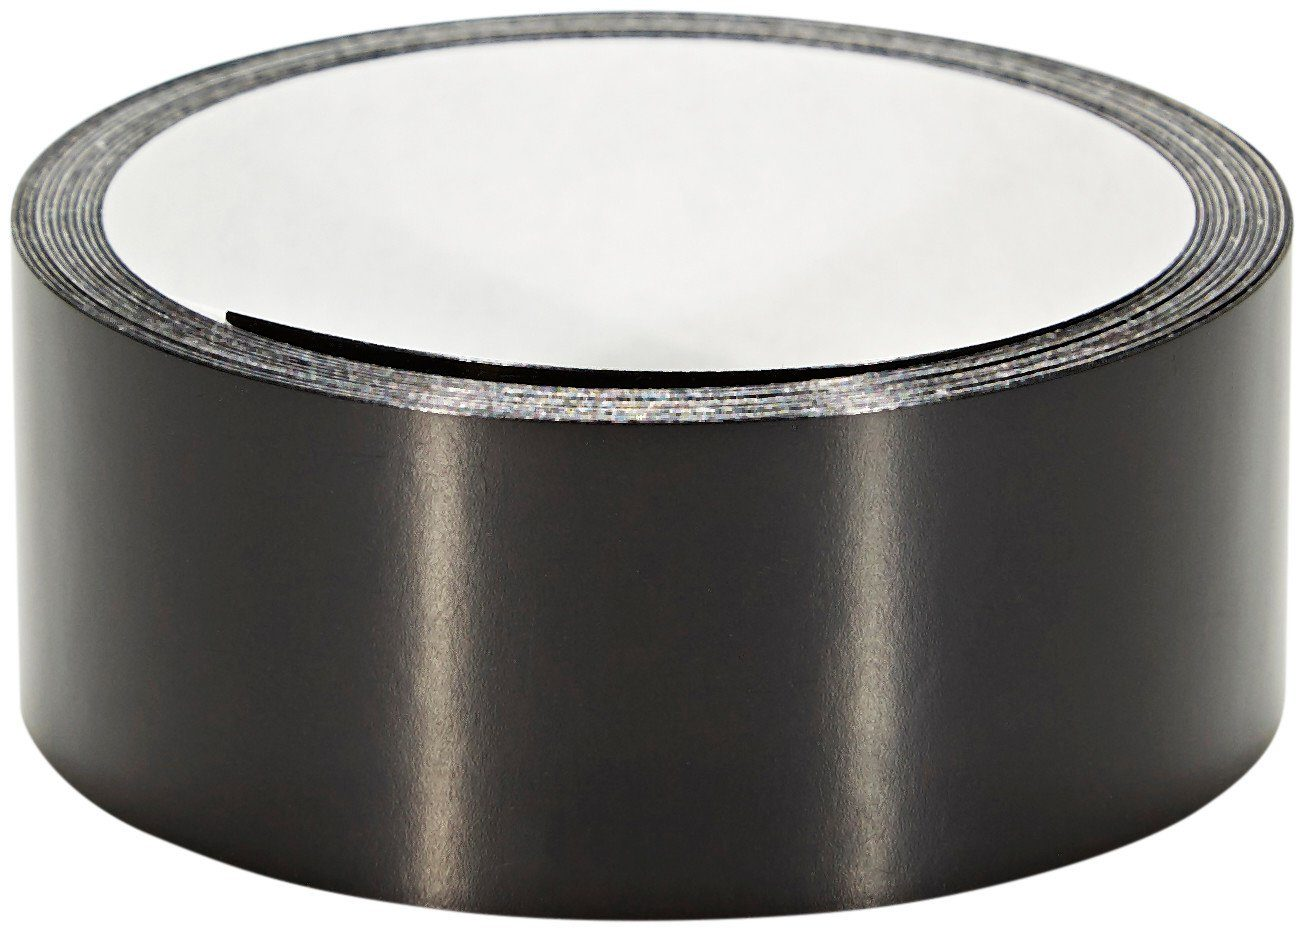 "Shimano Felgenband »WH-M9000-TL-F15 Felgenband Tubeless 29""«"